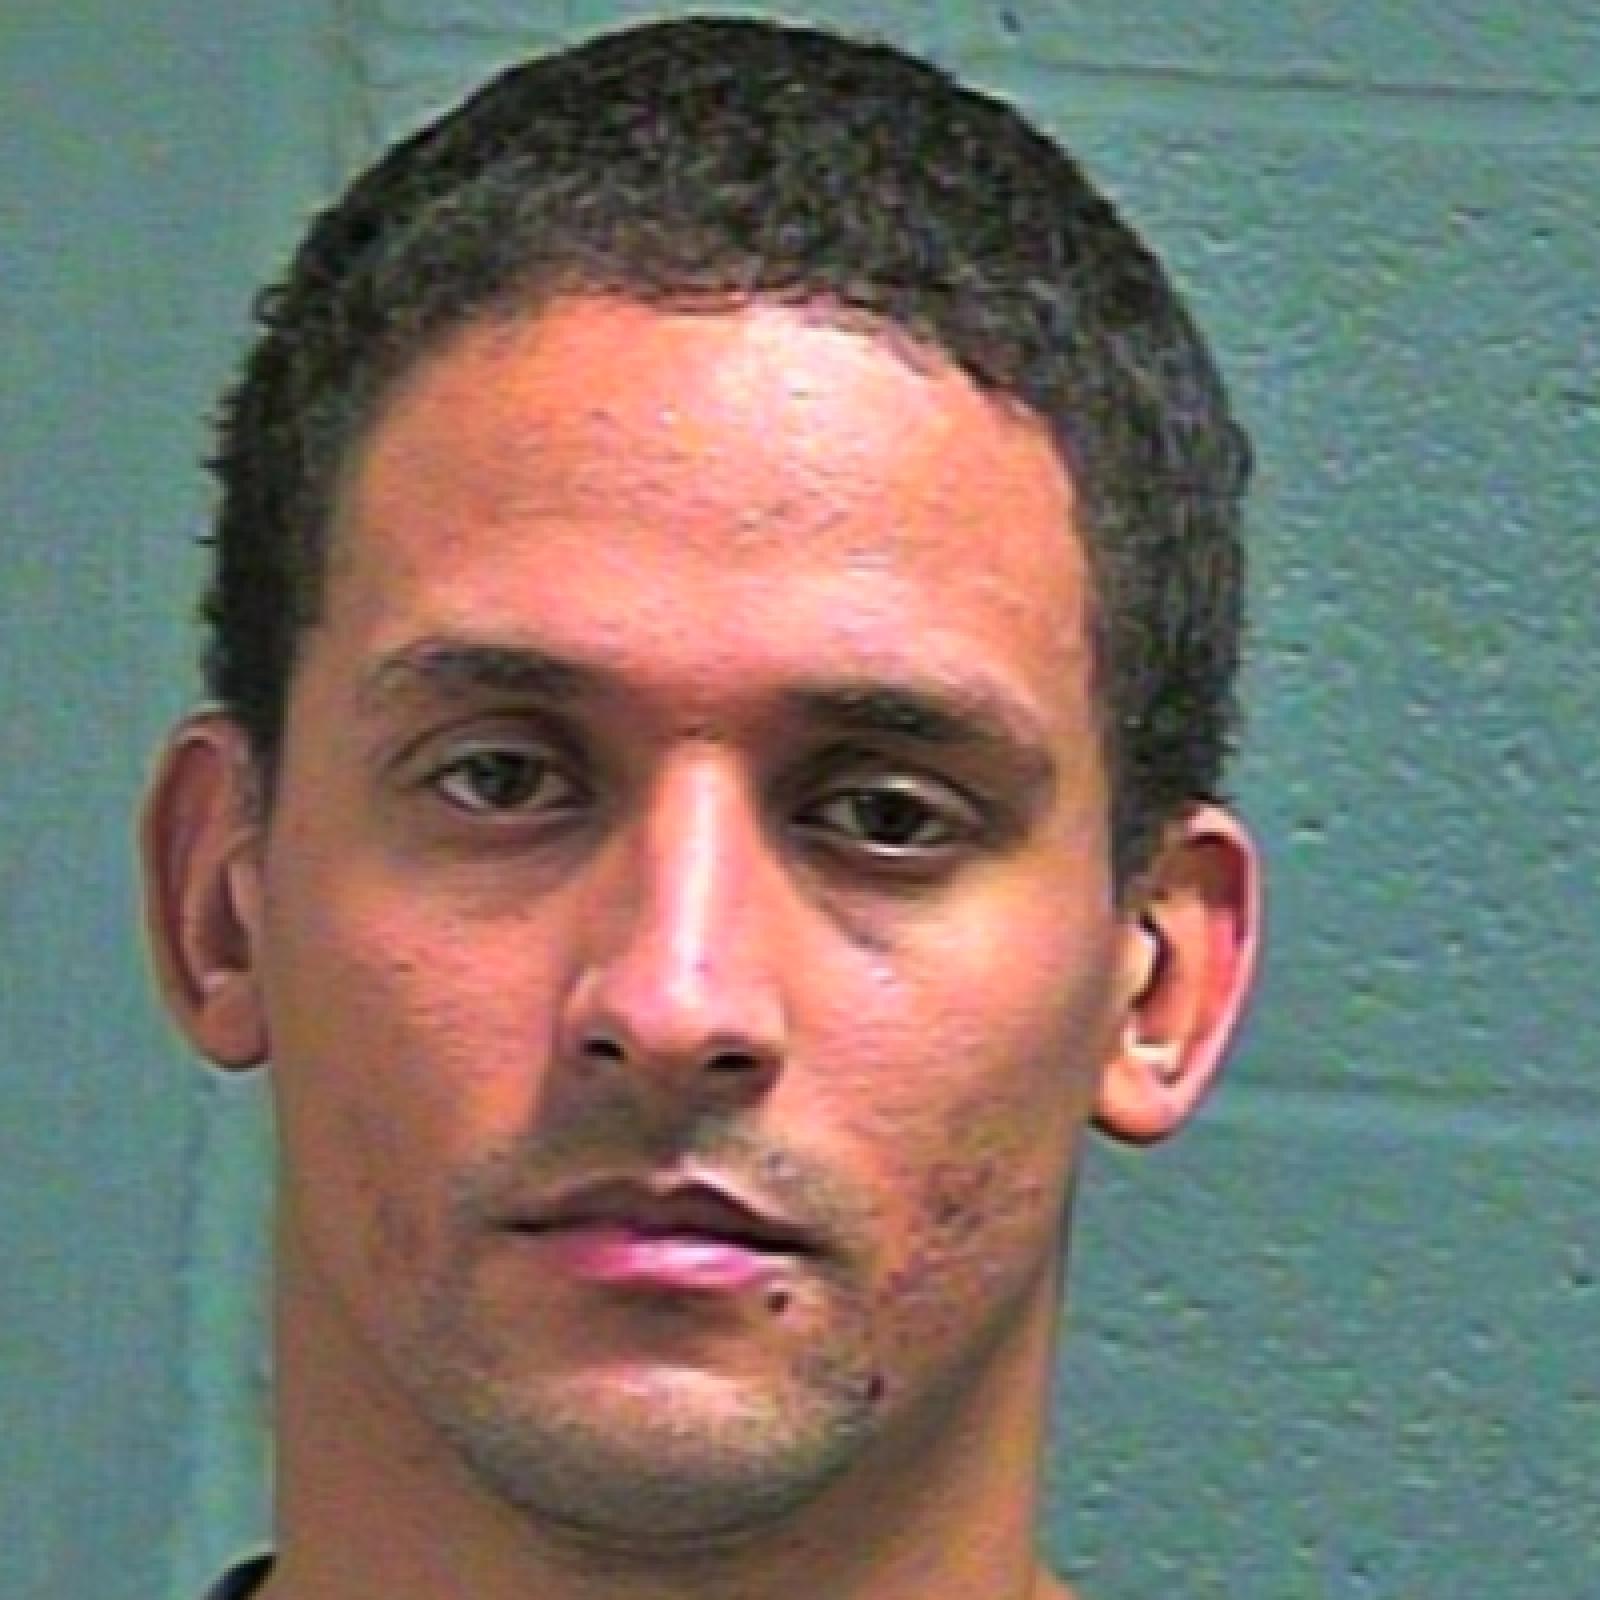 Oklahoma Wrestling Coach, 27, Arrested for Allegedly Having